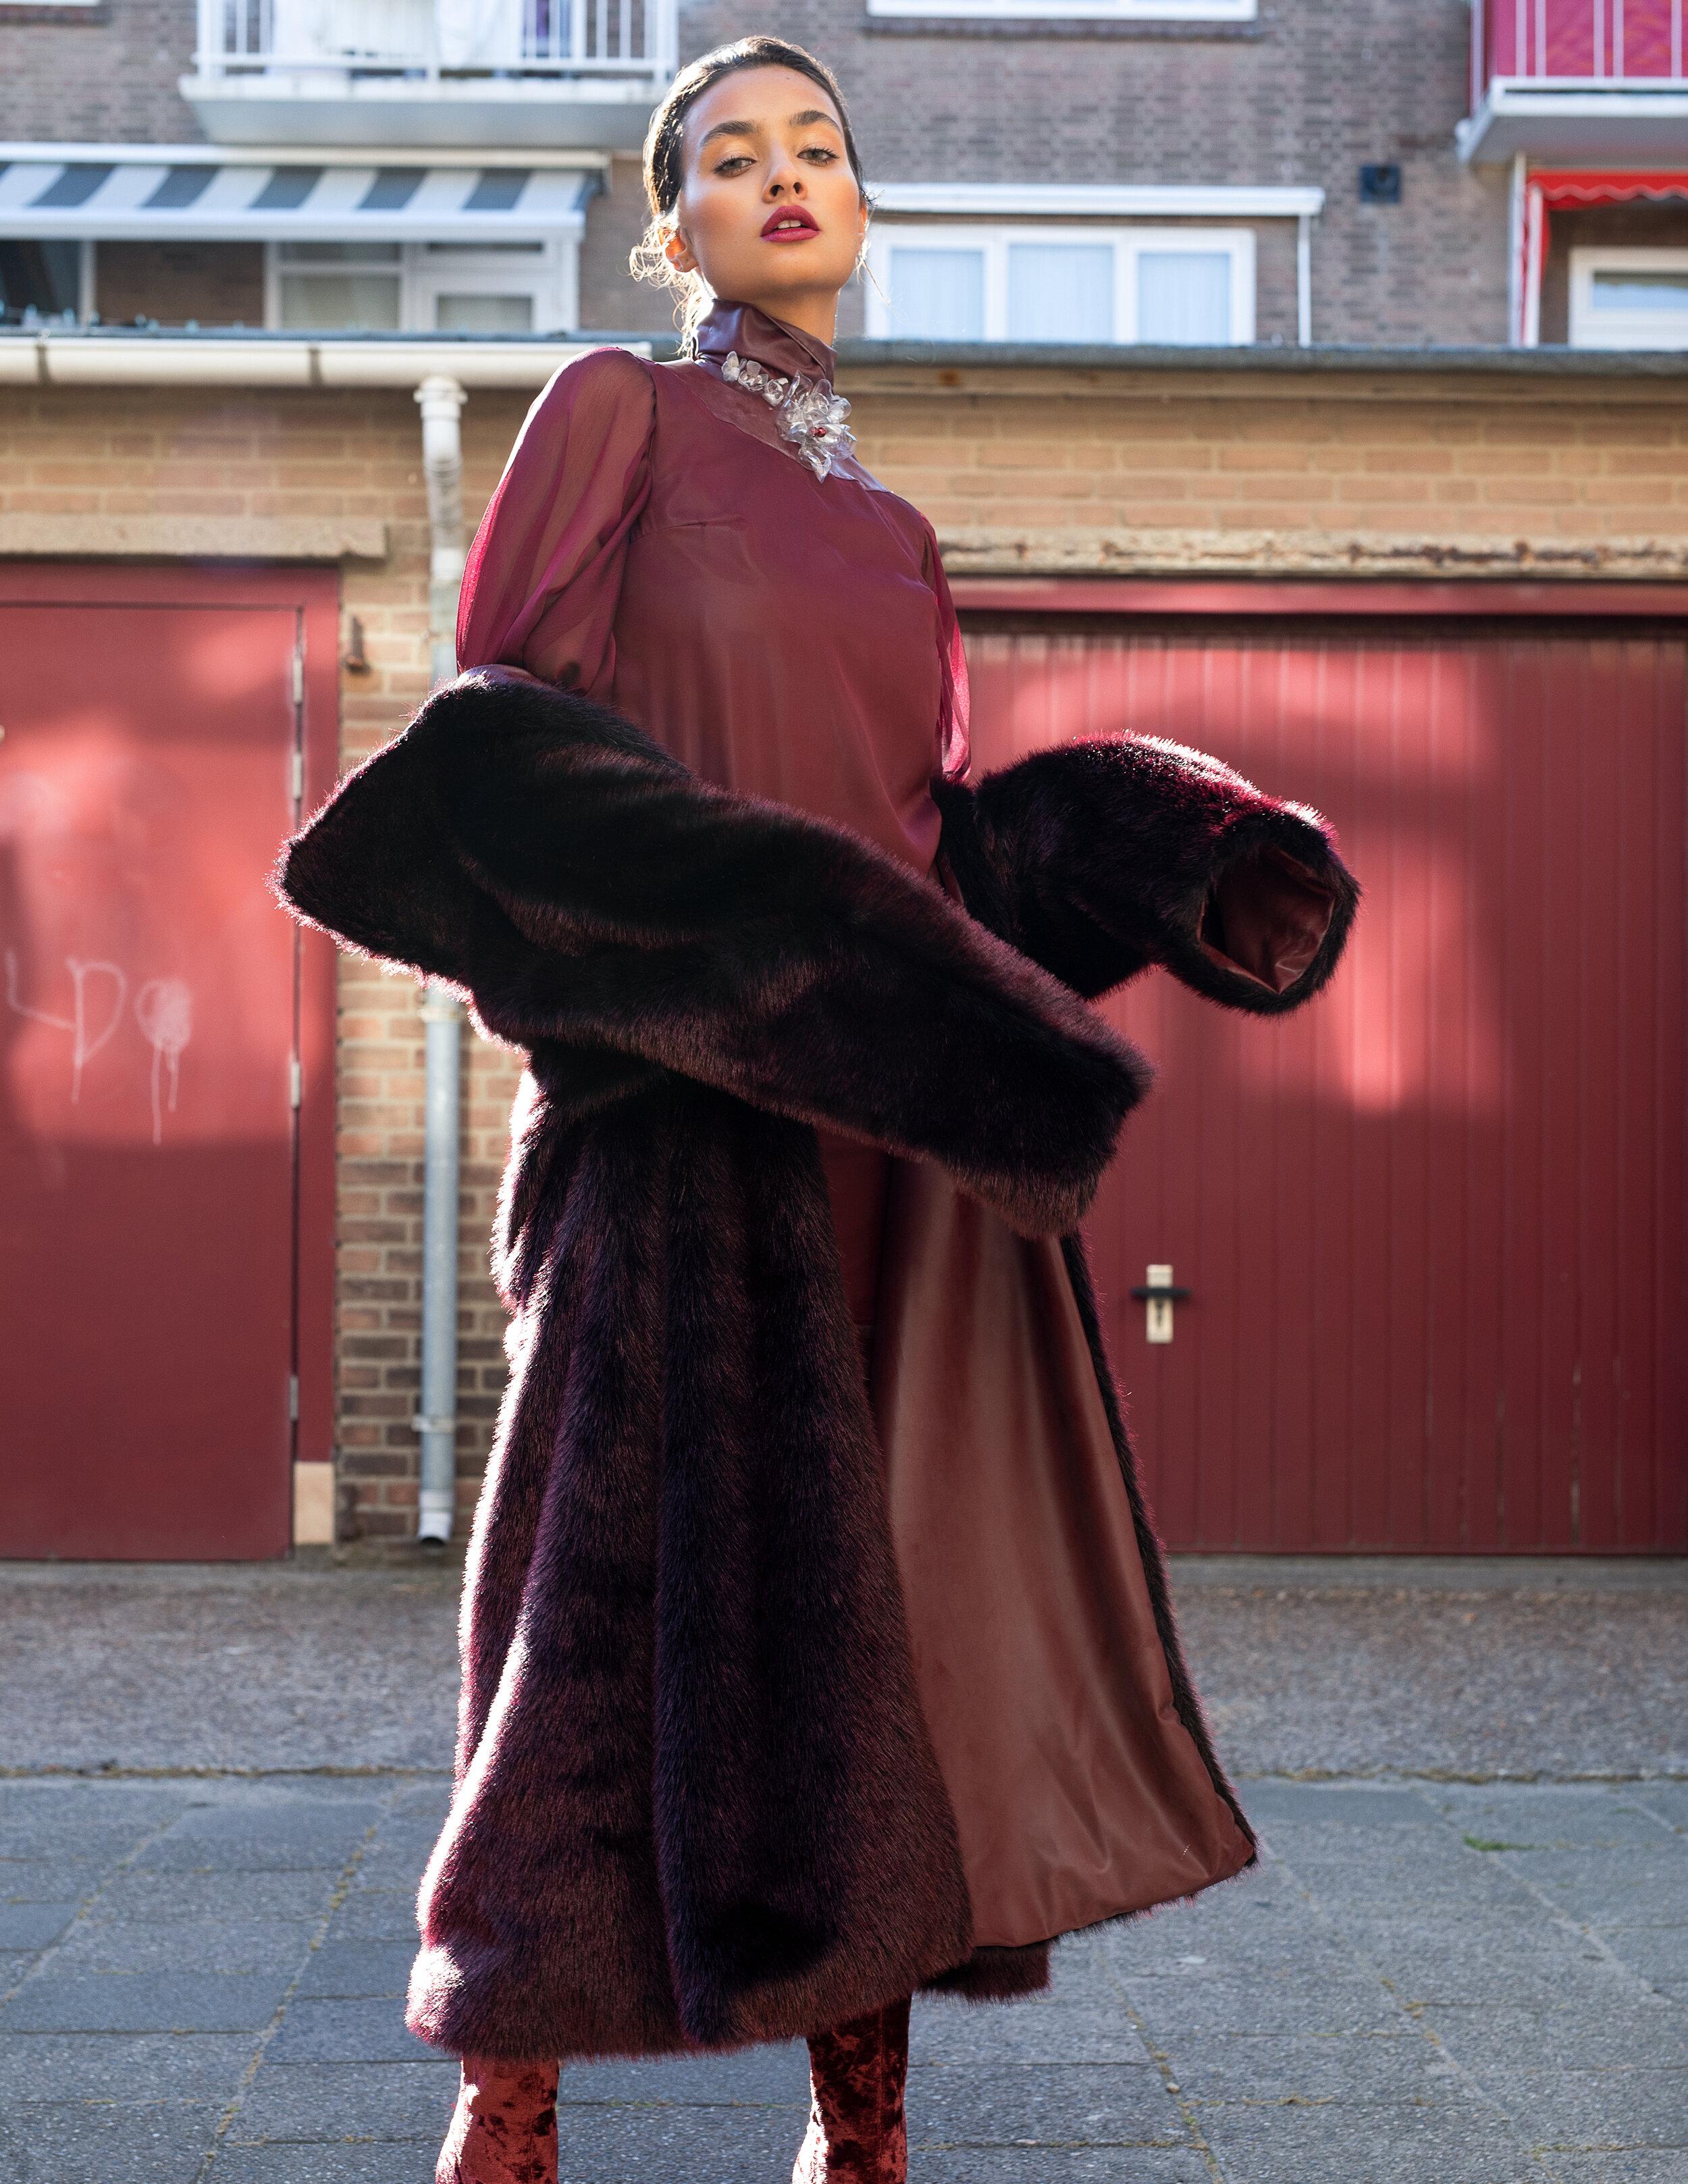 Dress: Lea Pozzi  Coat: Lea Pozzi